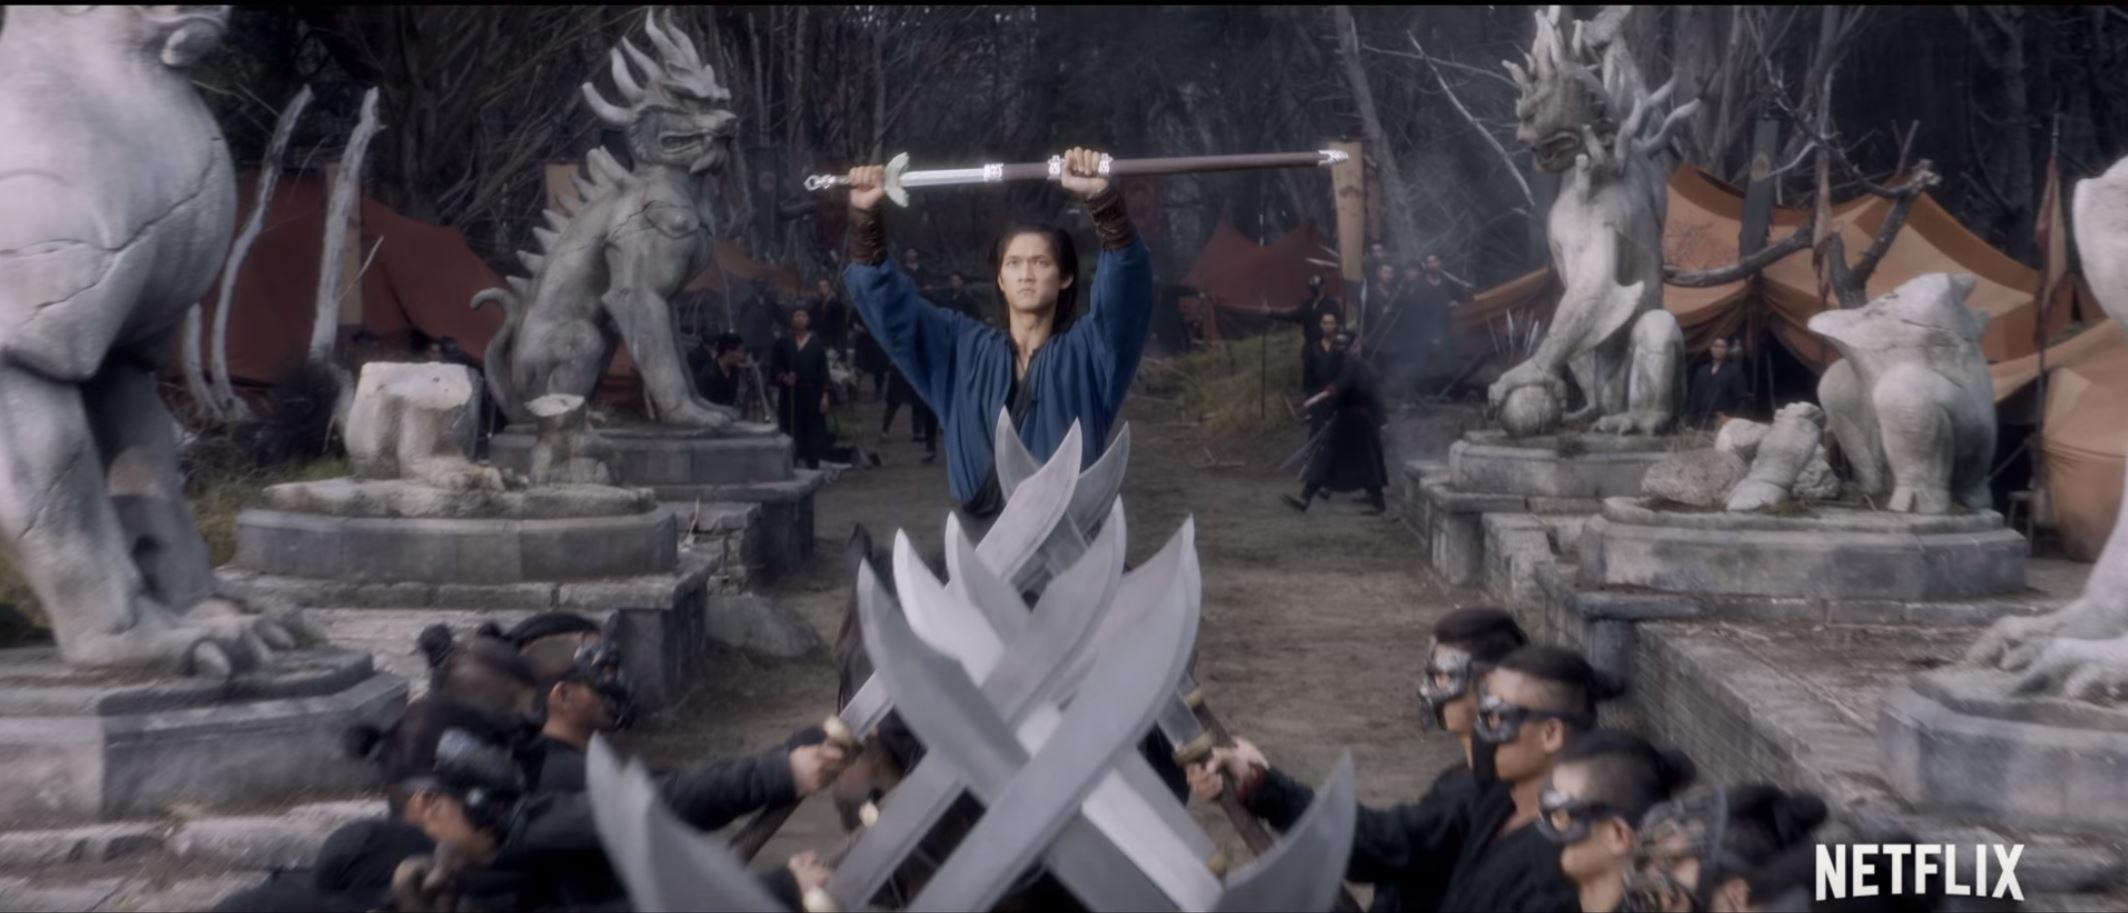 New Trailer For Crouching Tiger, Hidden Dragon: Sword of Destiny